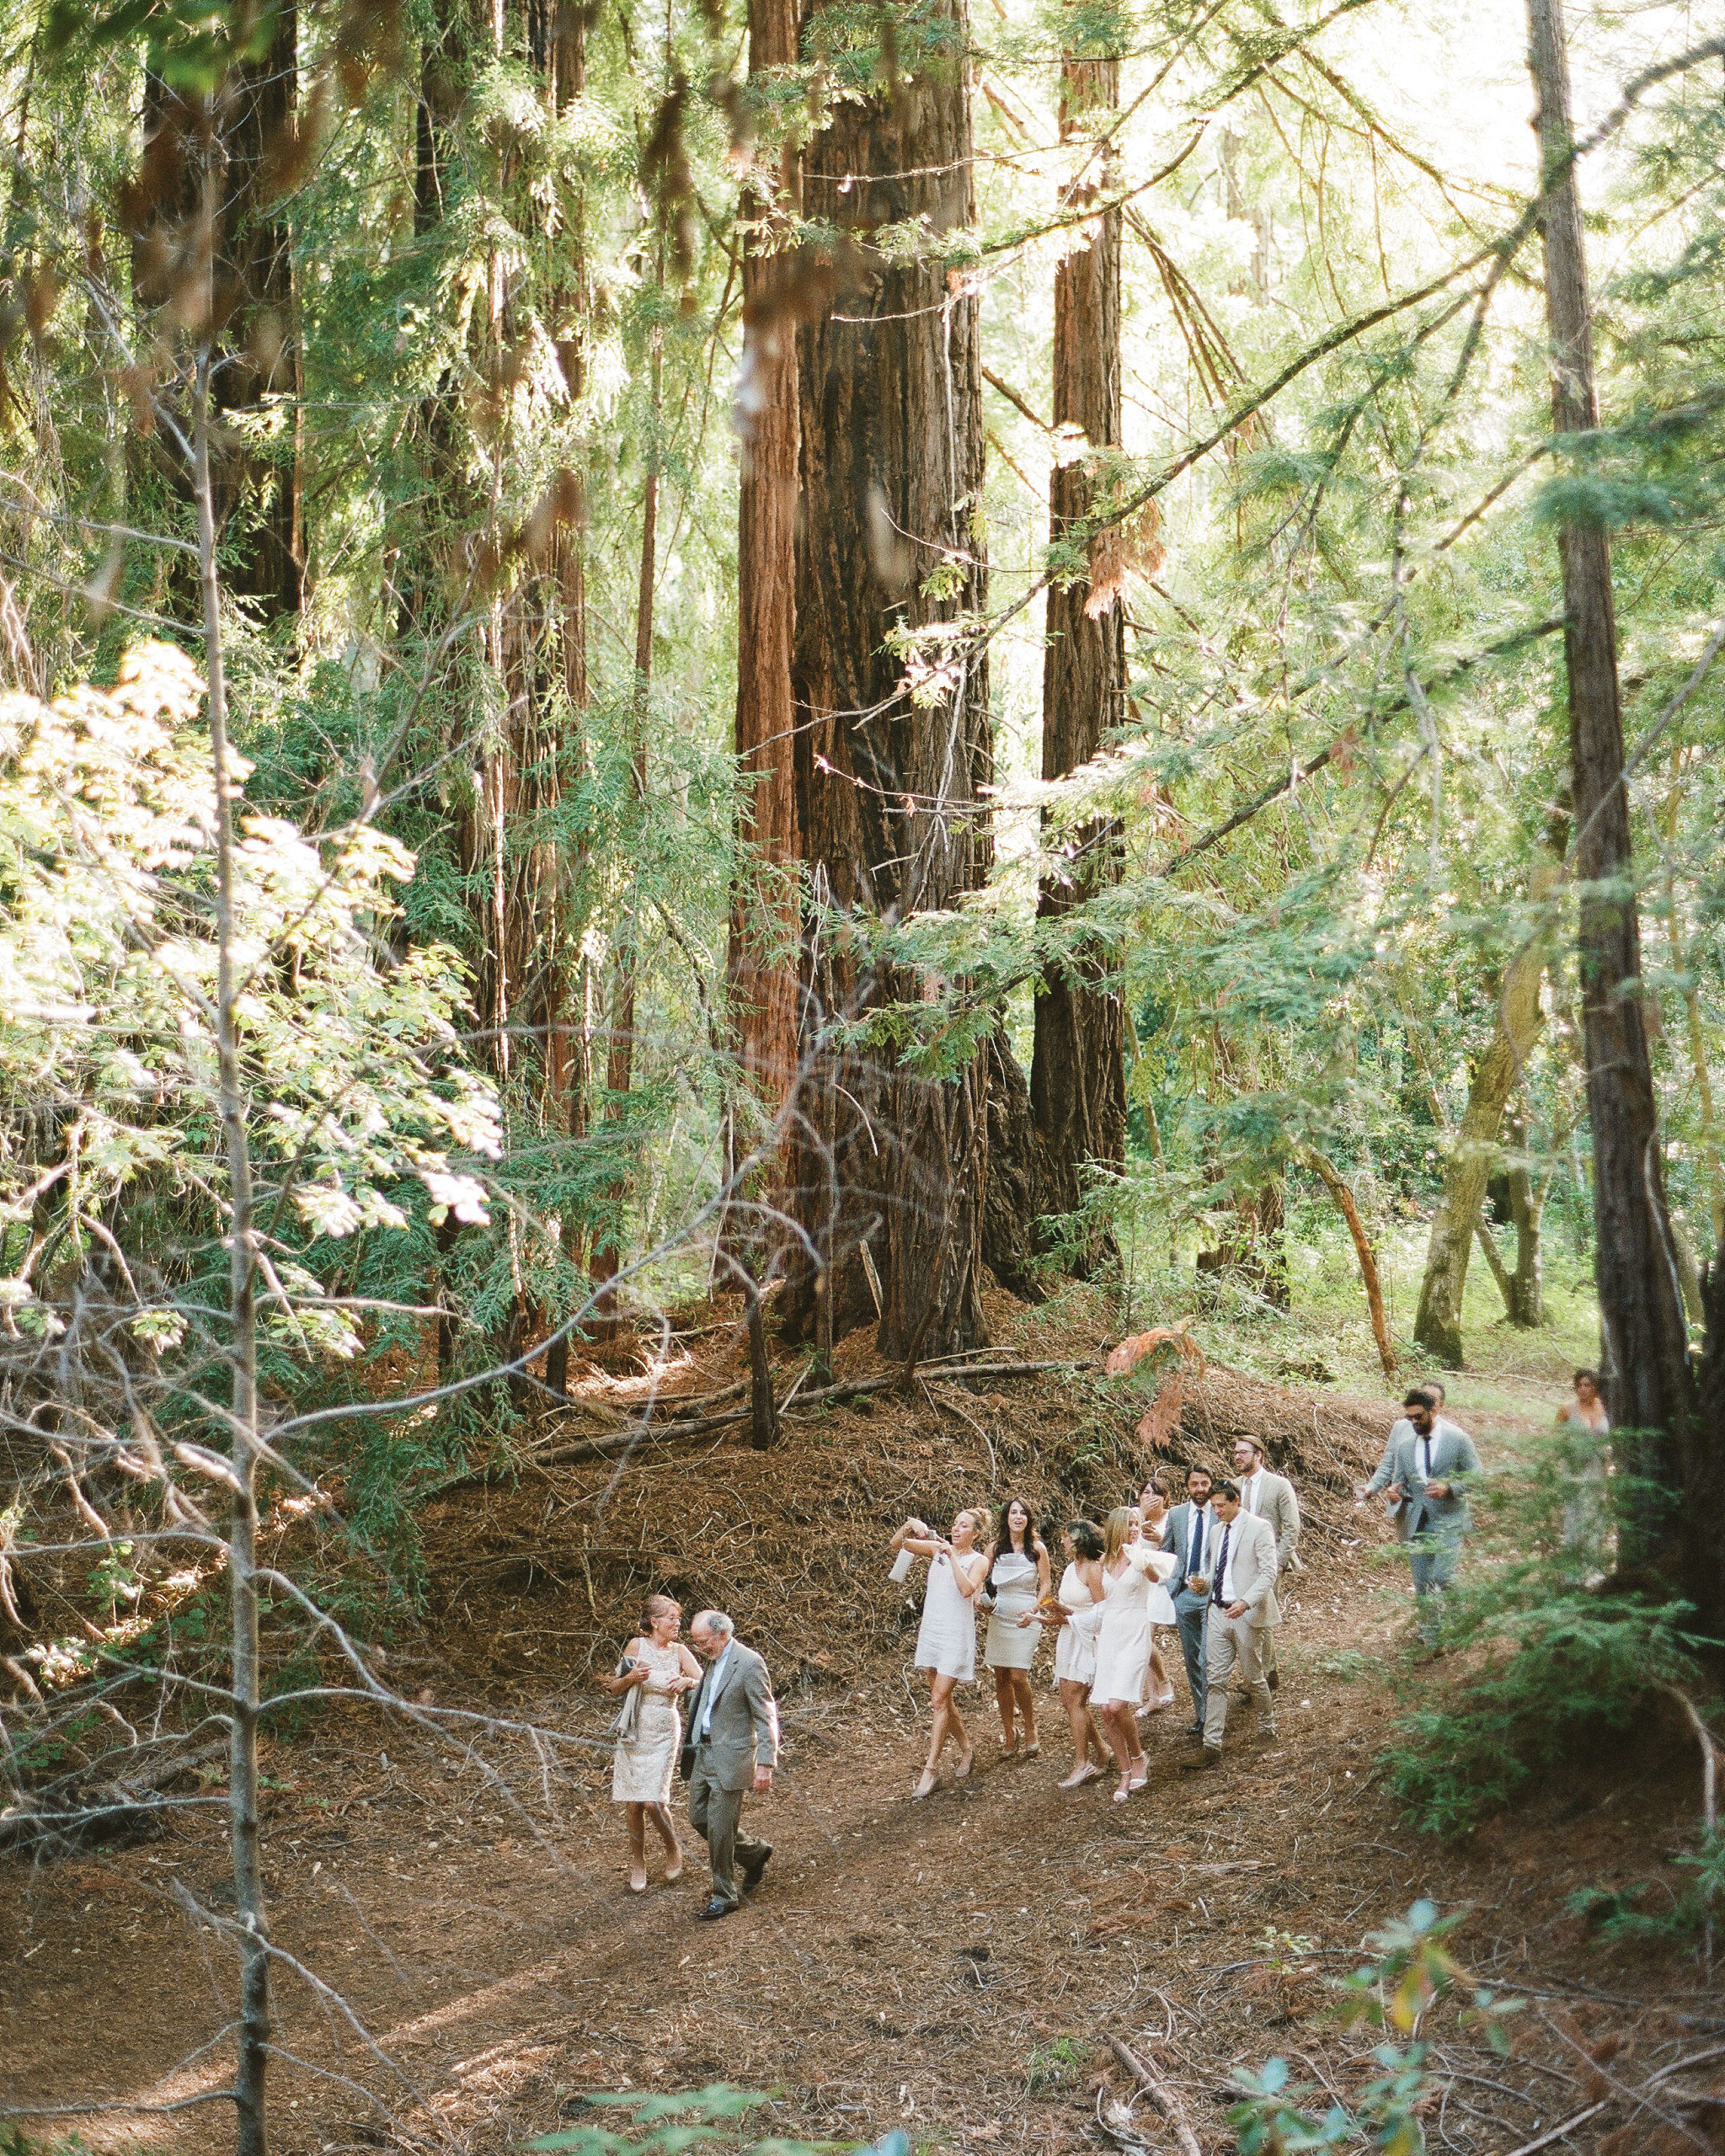 breelayne-hunter-wedding-california-guests-arriving-0058-santa-lucia-preserve-fairy-woodsy-organic-s112849.jpg